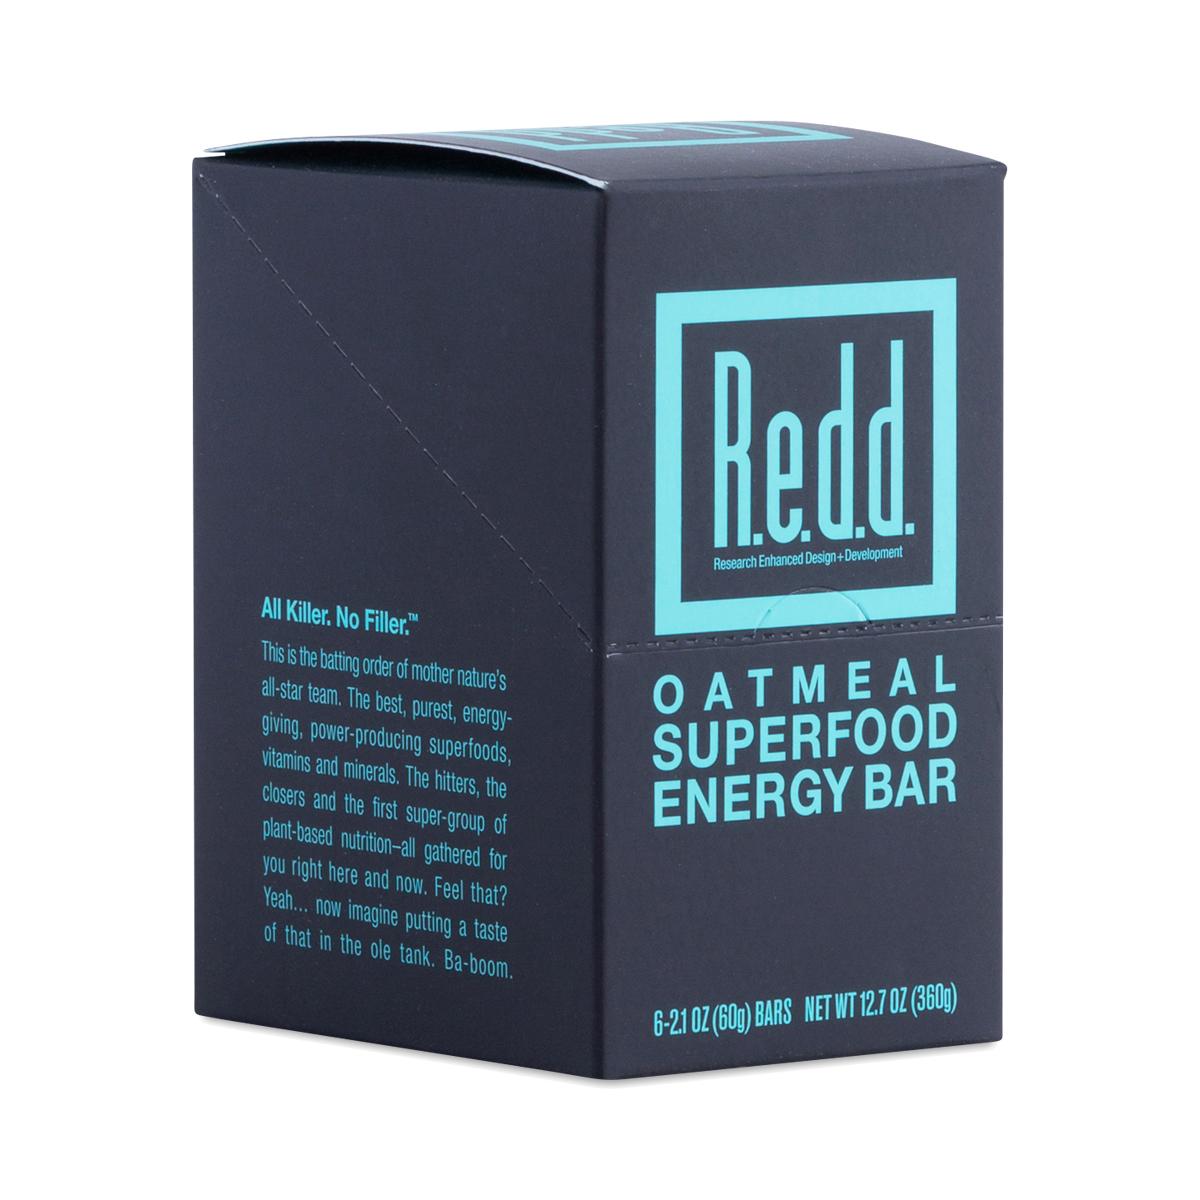 Redd Oatmeal Superfood Energy Bar Six 2.2 oz bars